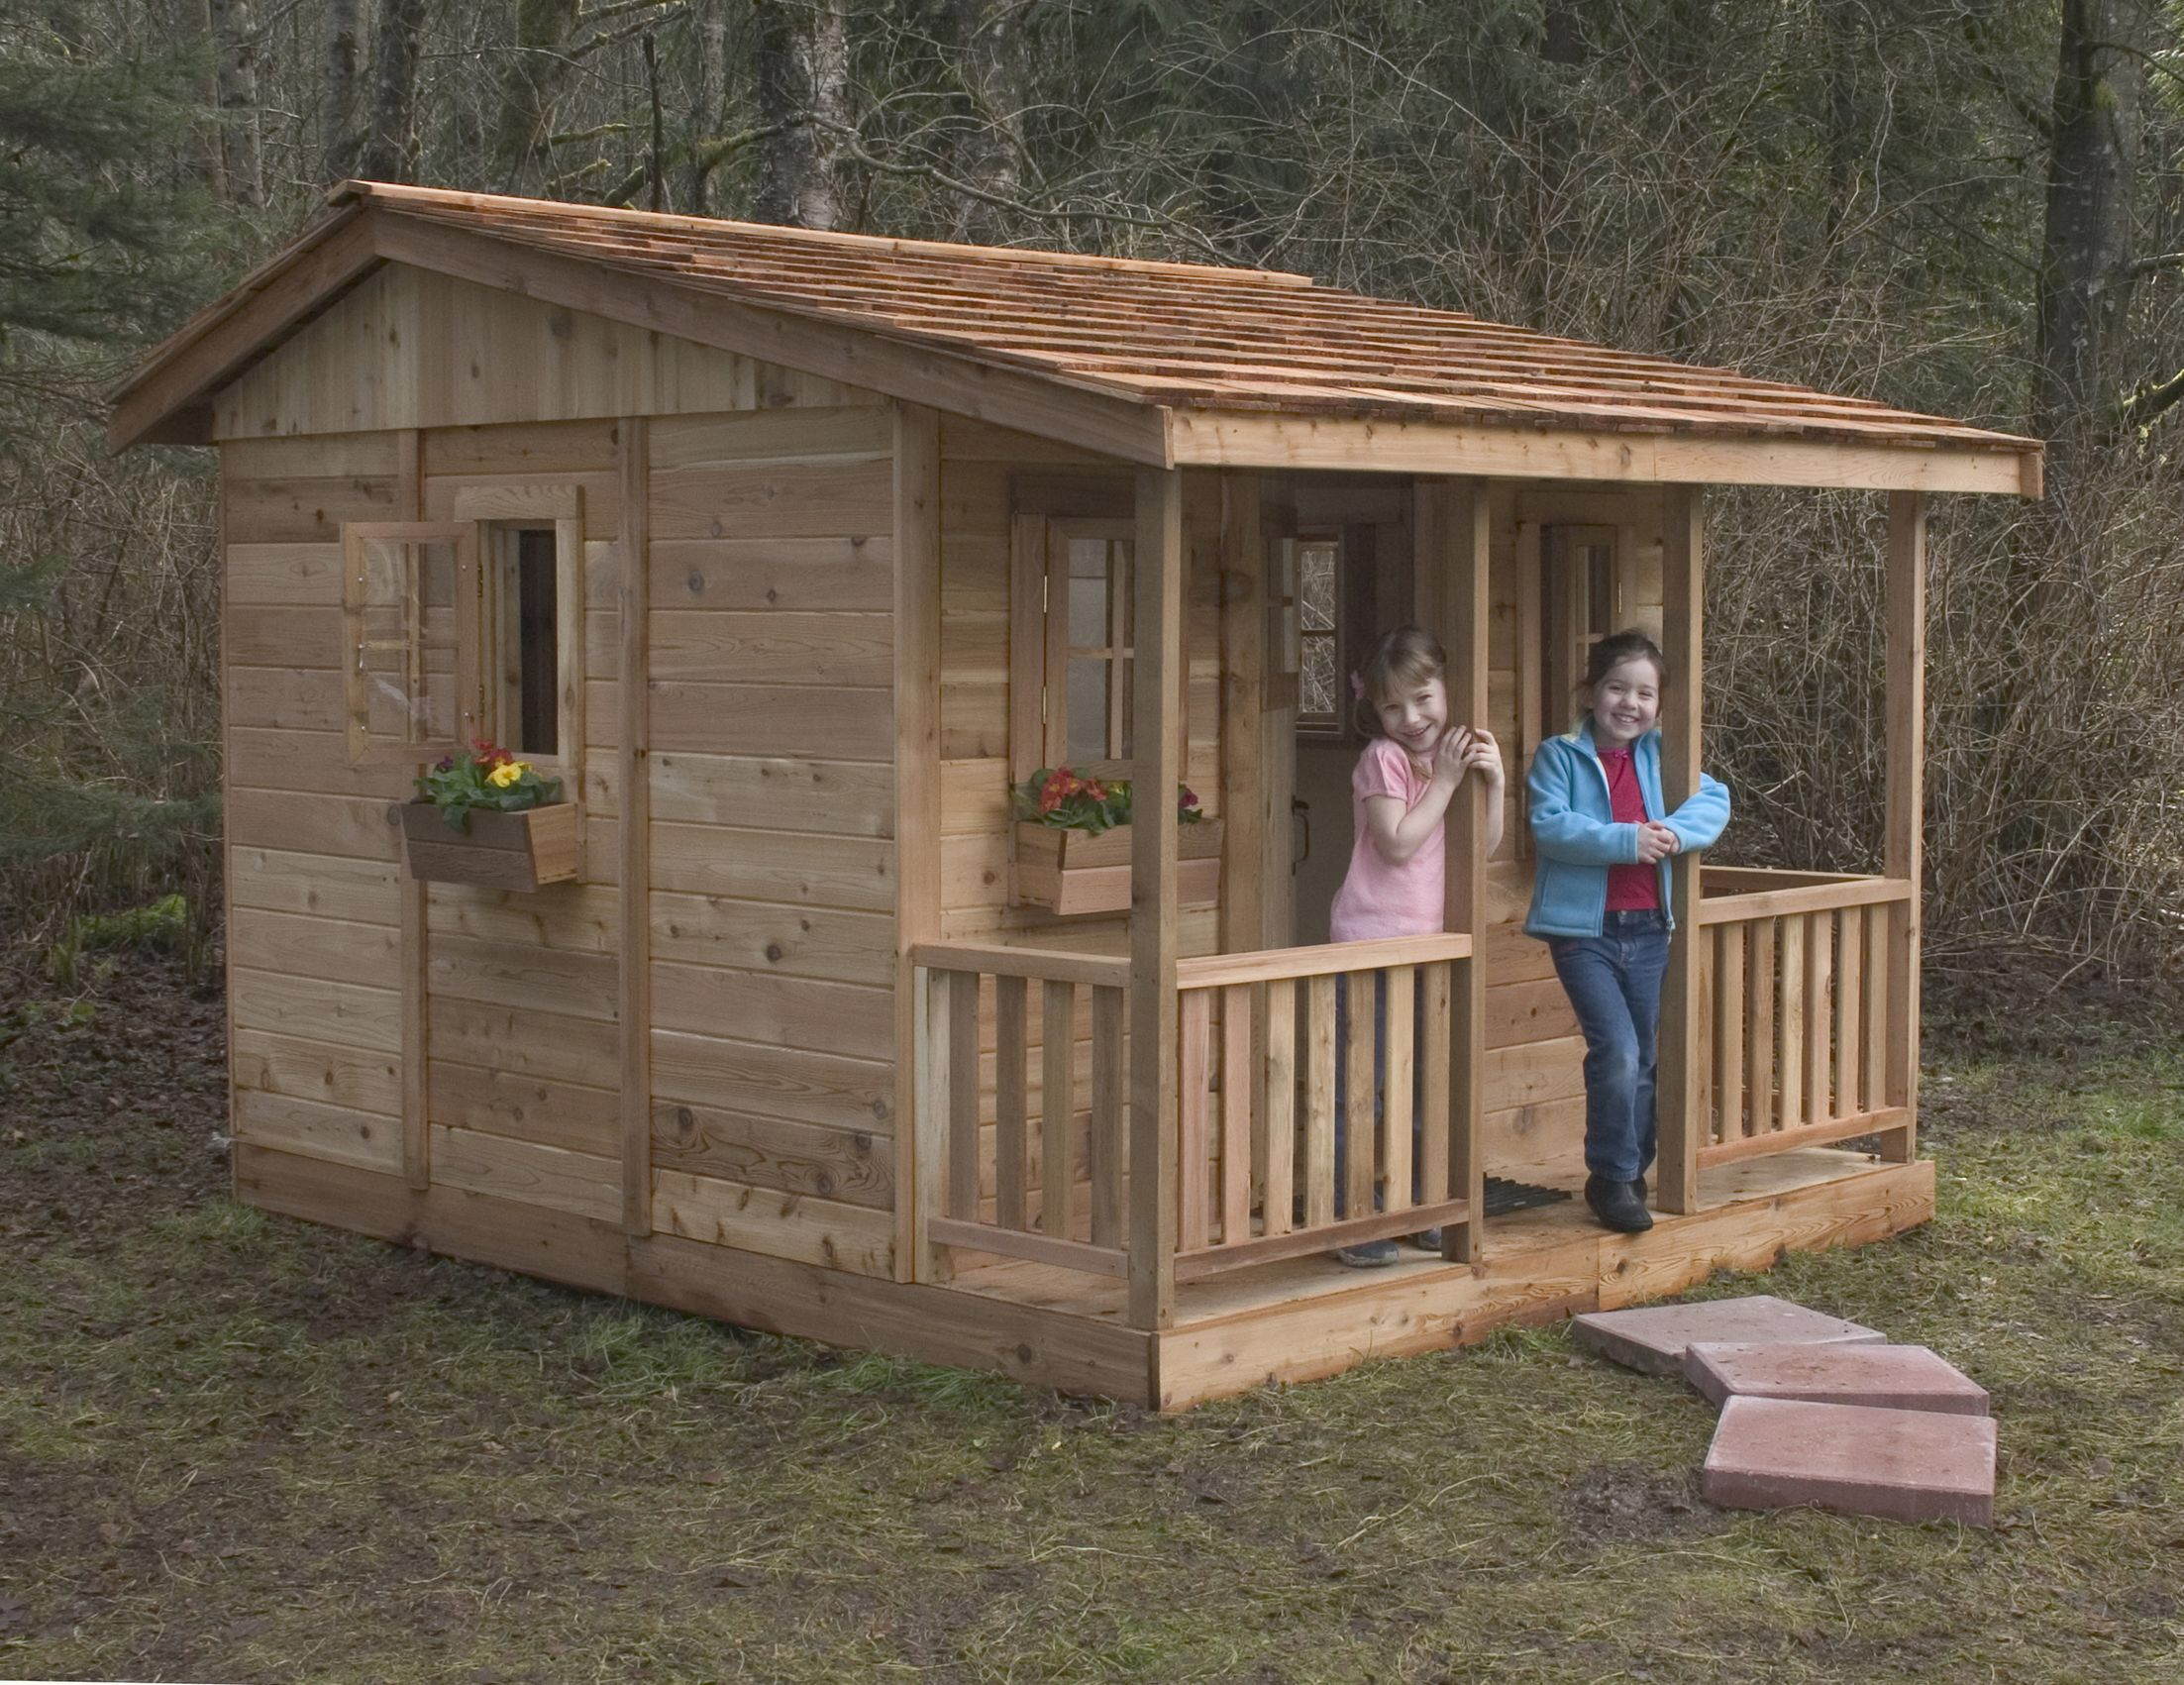 Cozy Cabin 9 X 7 Cedar Playhouse Pallet Playhouse